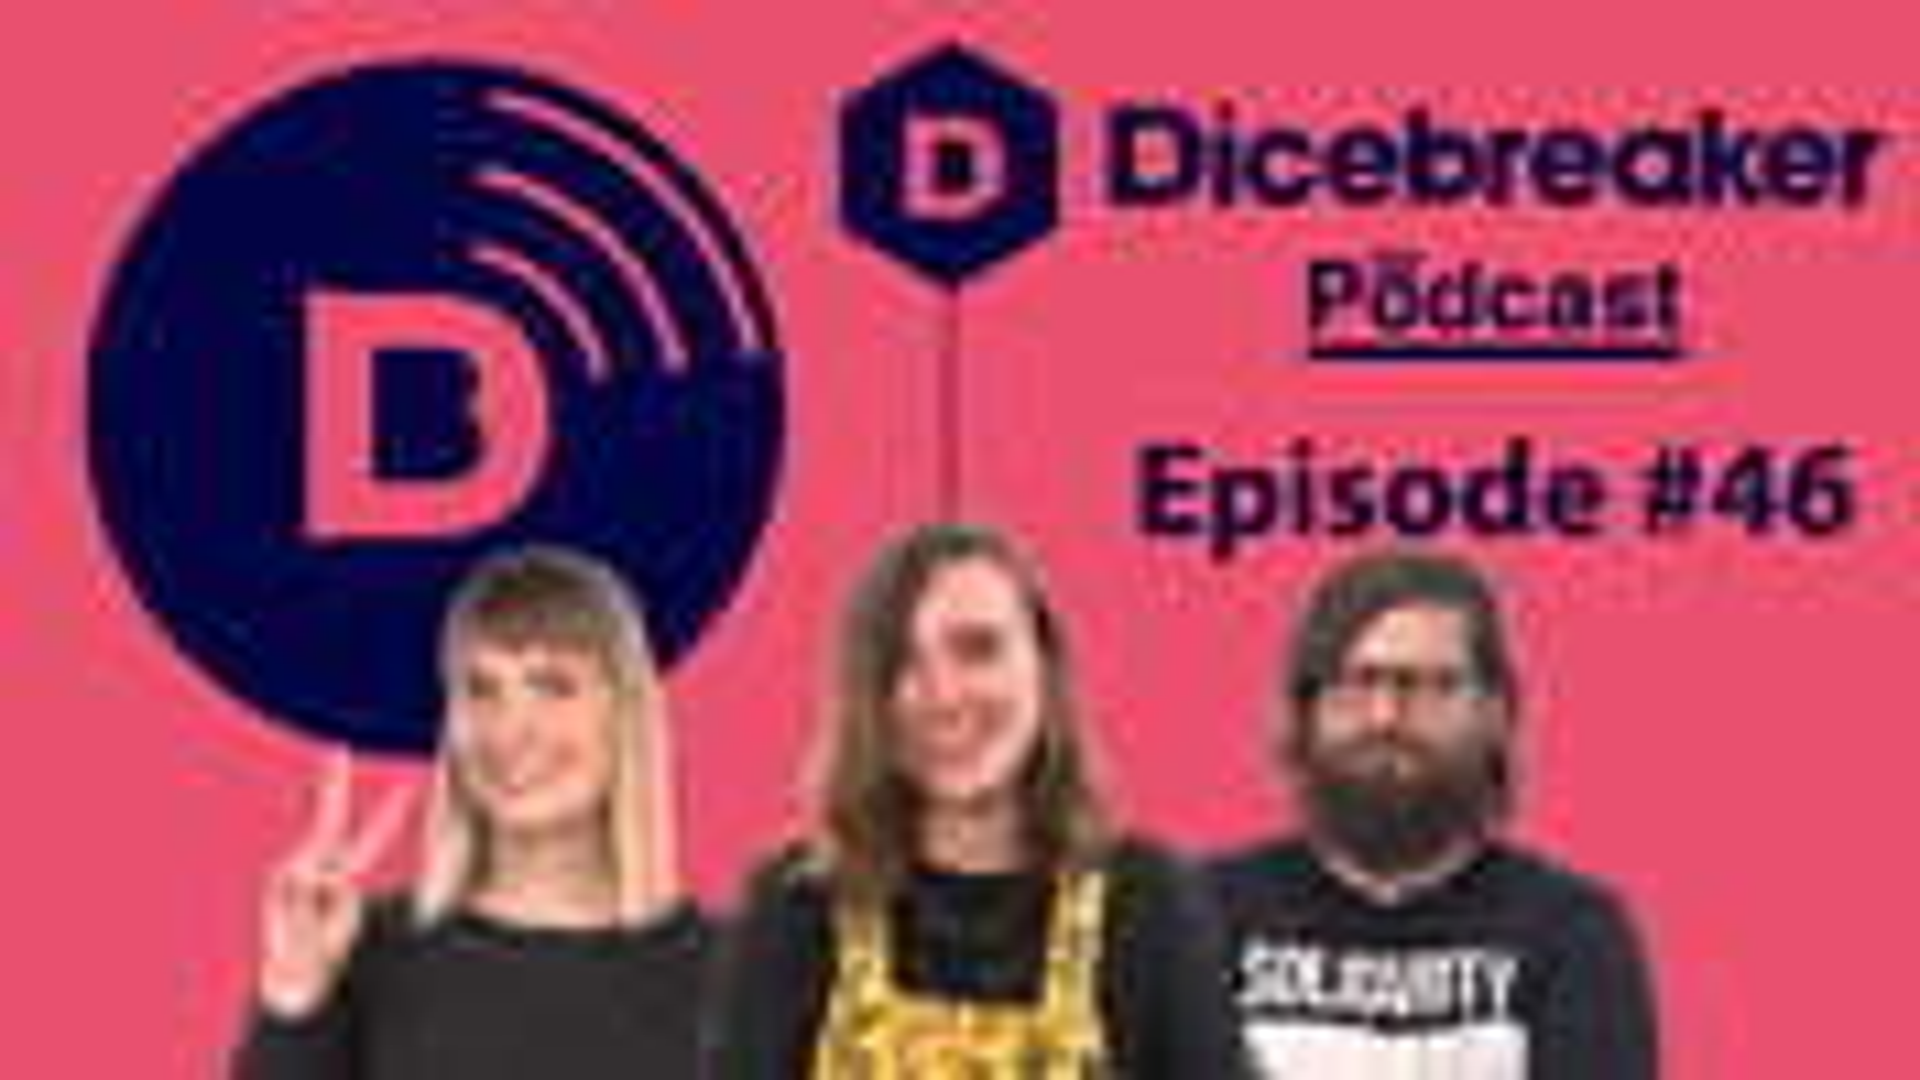 Podcast Episode 46